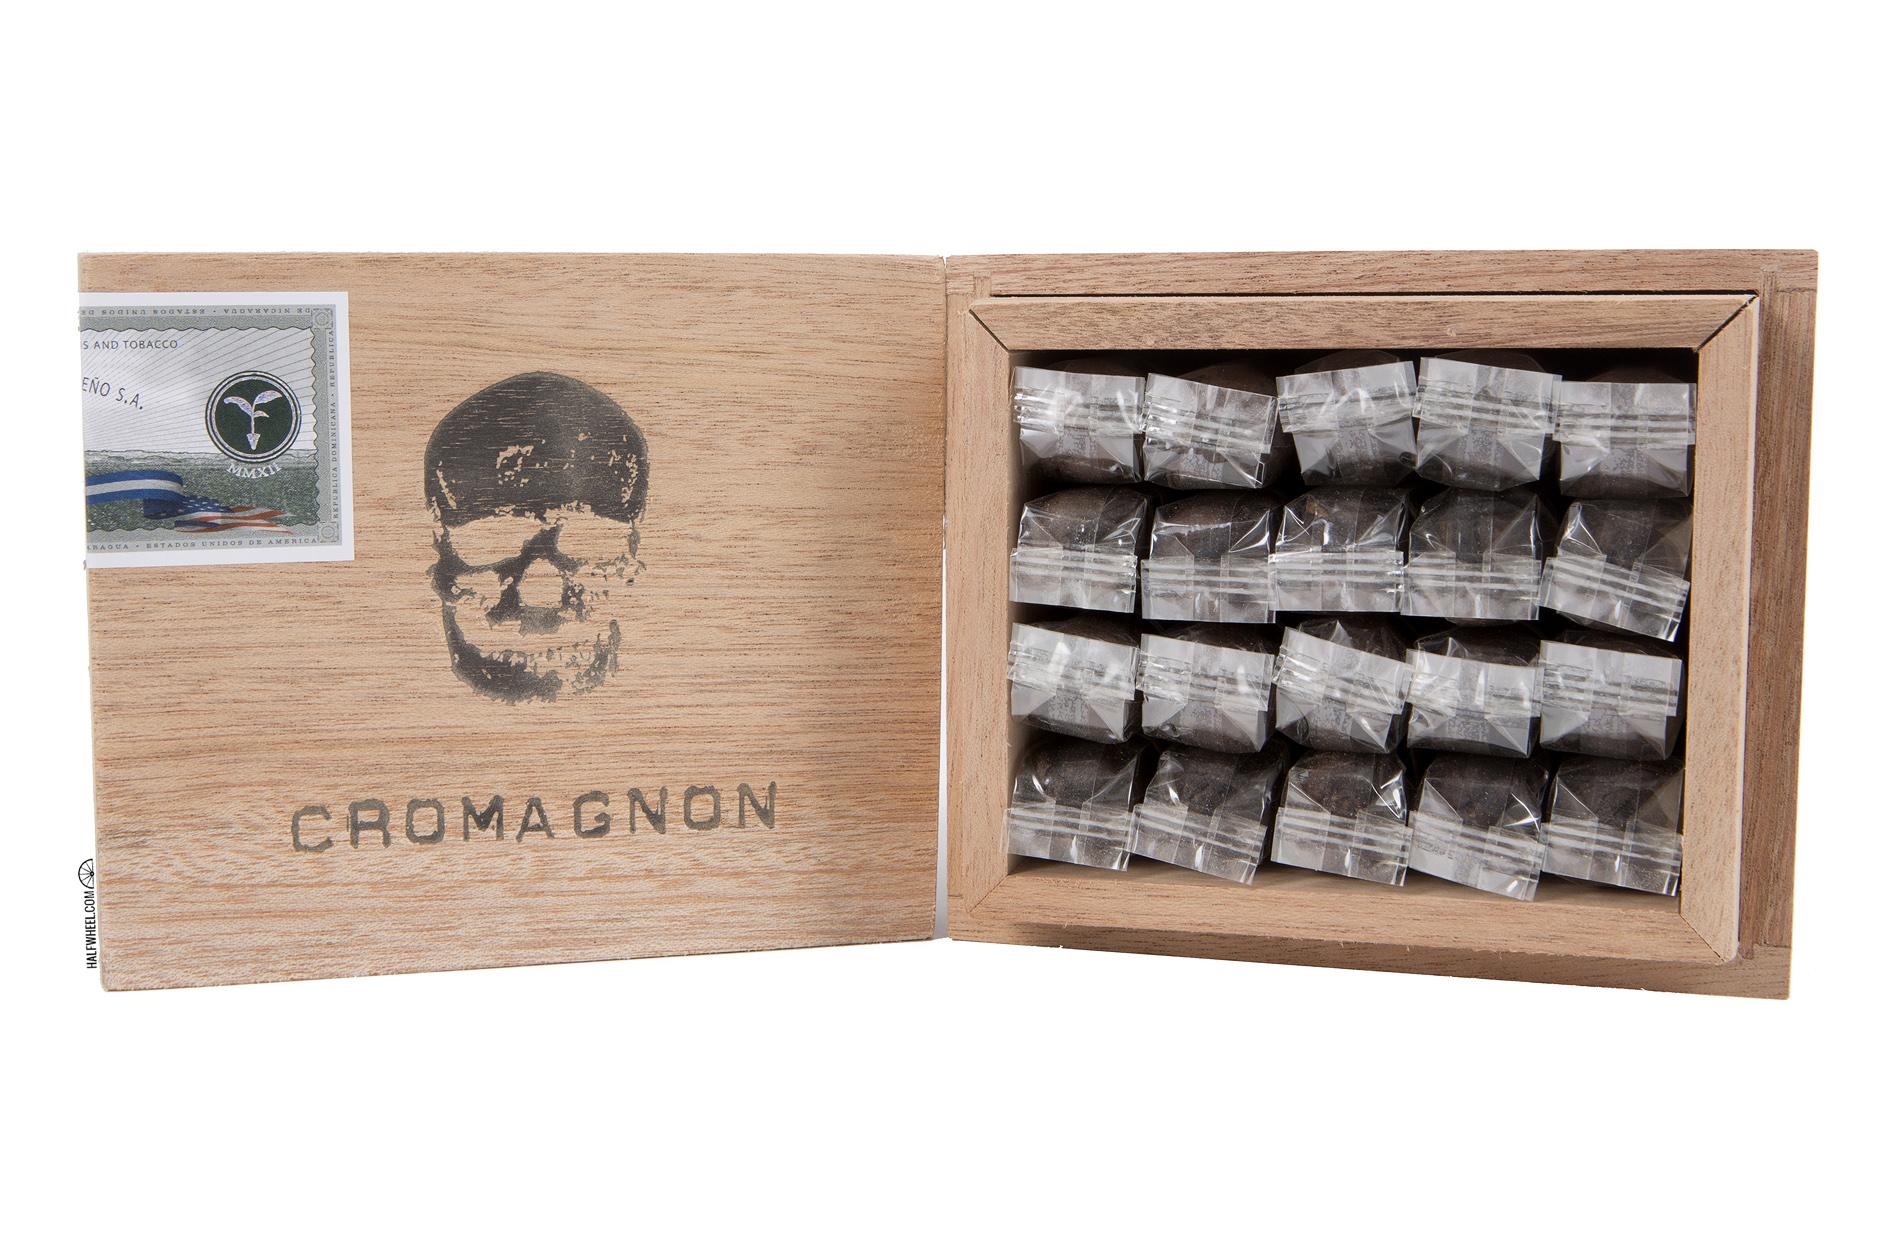 Cromagnon Firecracker Box 2